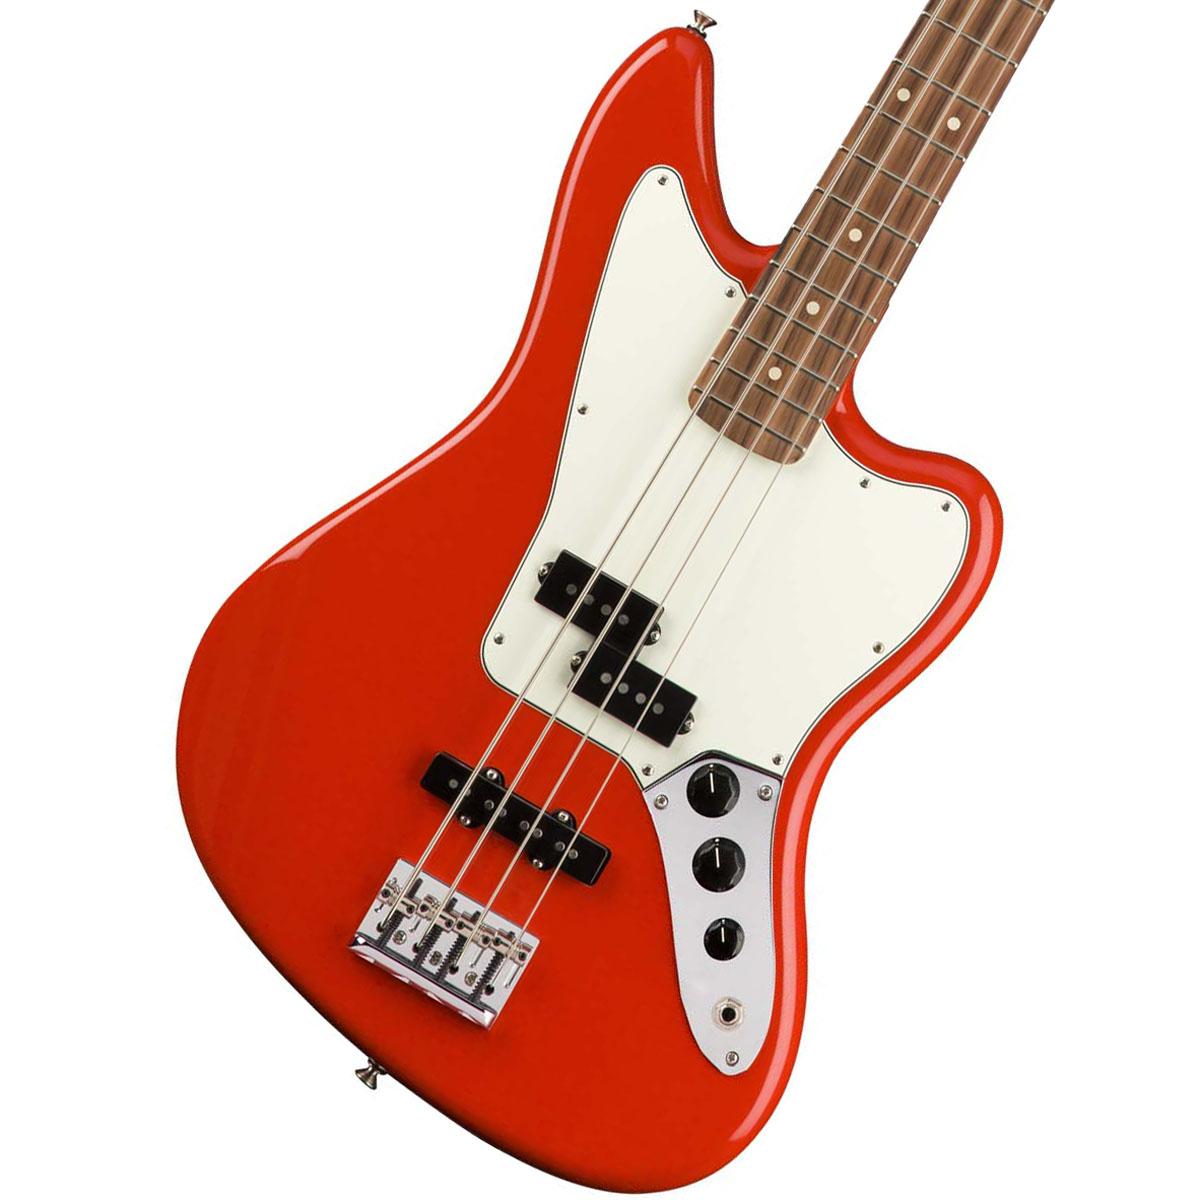 Fender/ Player Series Fender Jaguar Bass Pau Sonic Red Red Pau Ferro【YRK】, 天然石 パワーストーン cocoro堂:6376becc --- sunward.msk.ru